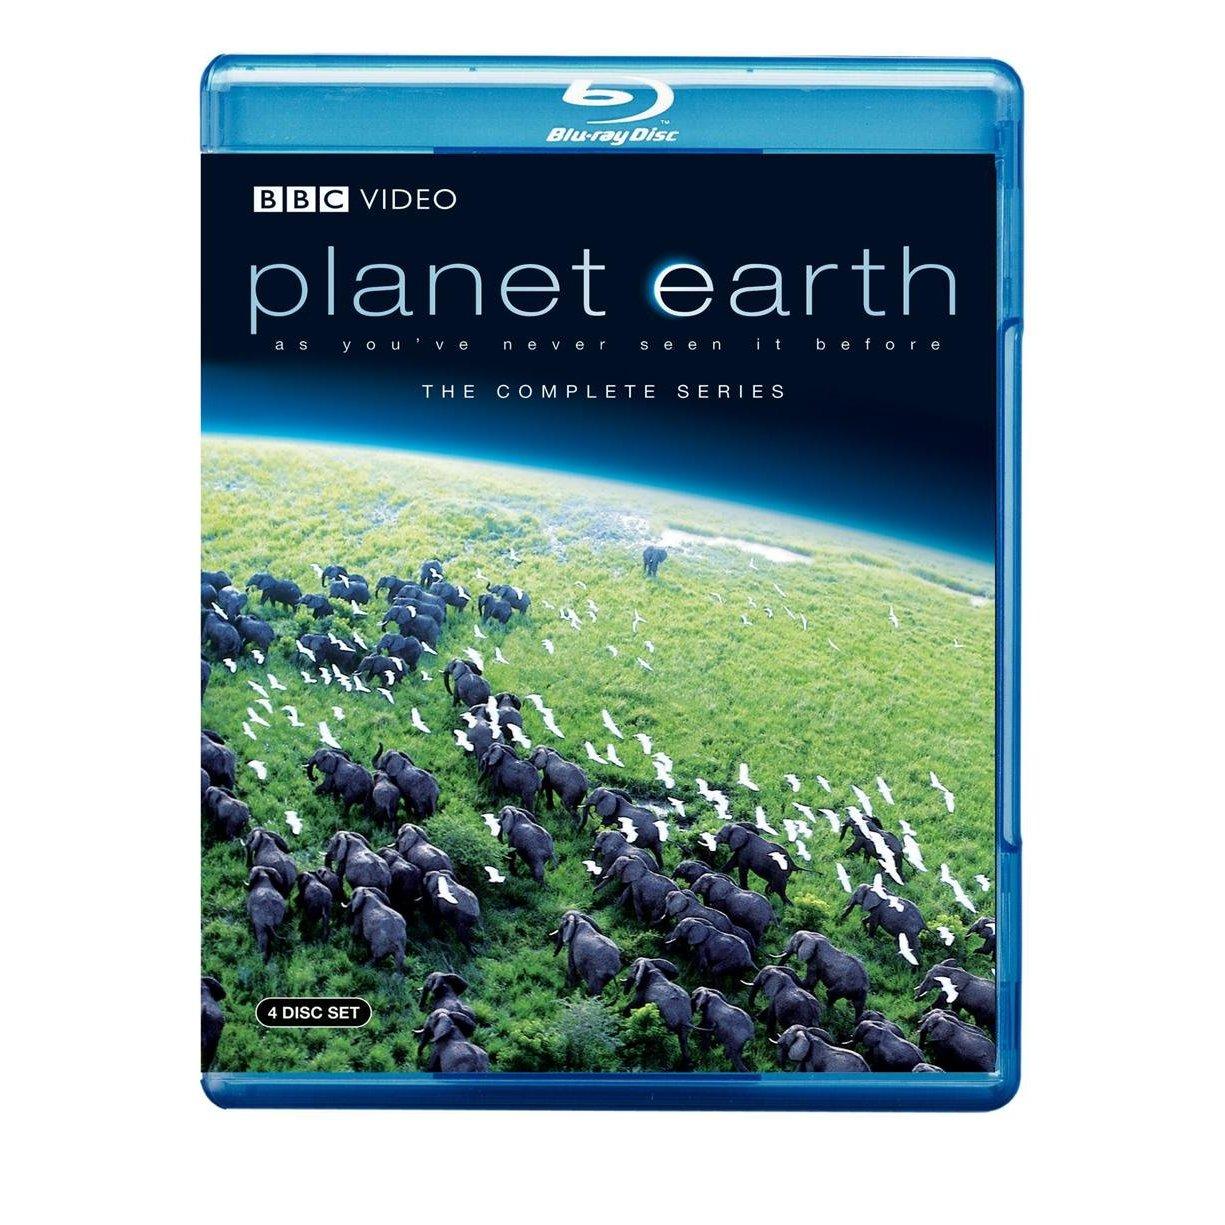 bbc planet earth series - photo #2